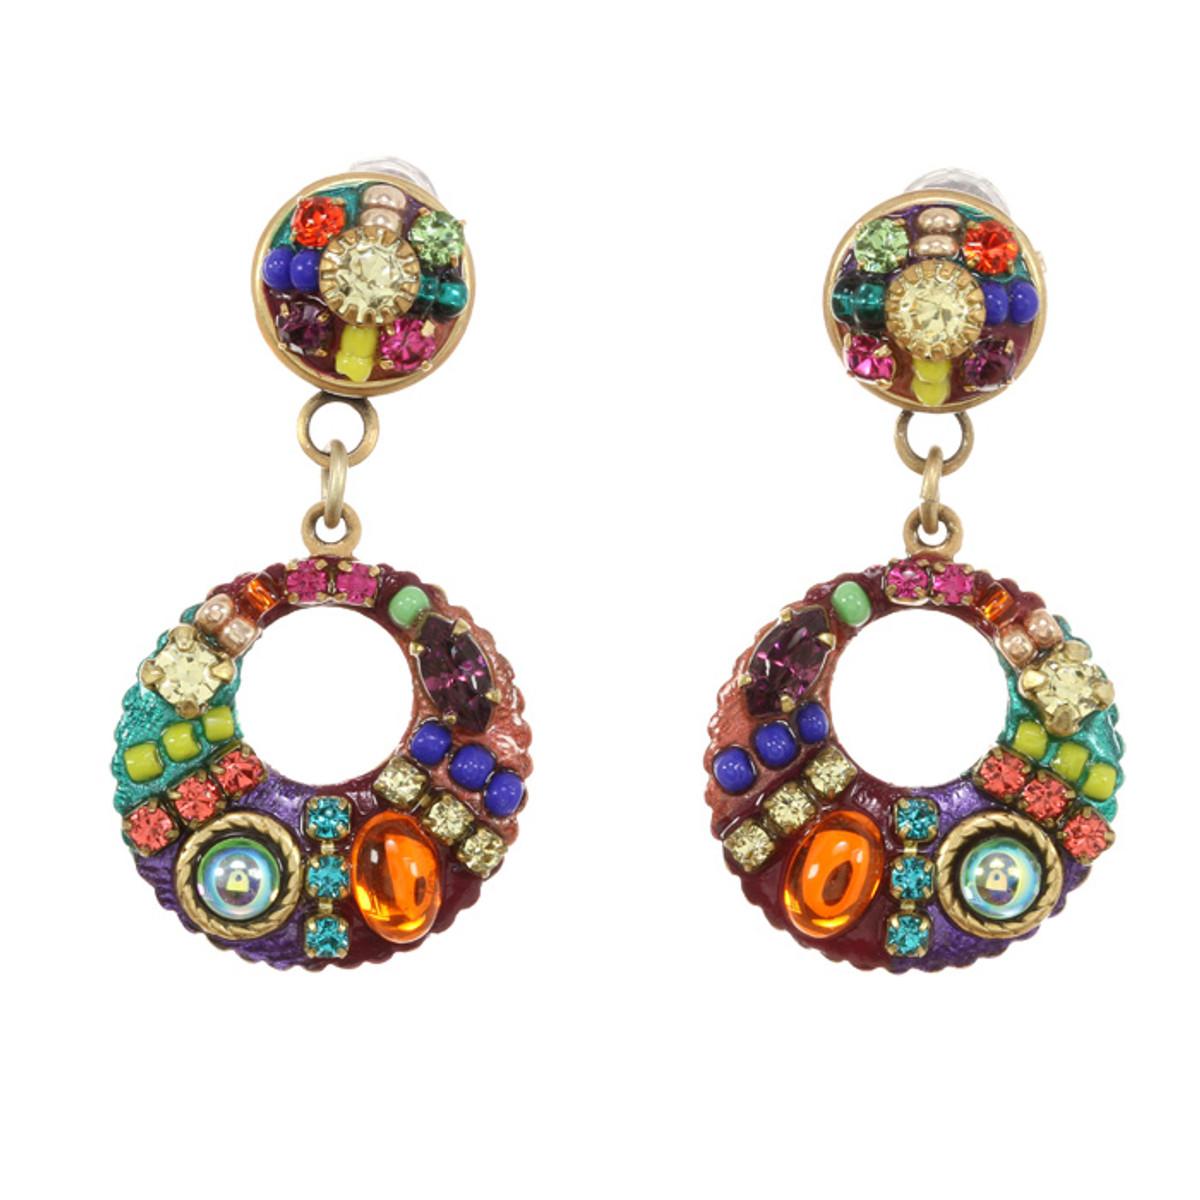 Michal Golan Earrings -Multibright Dangling loop